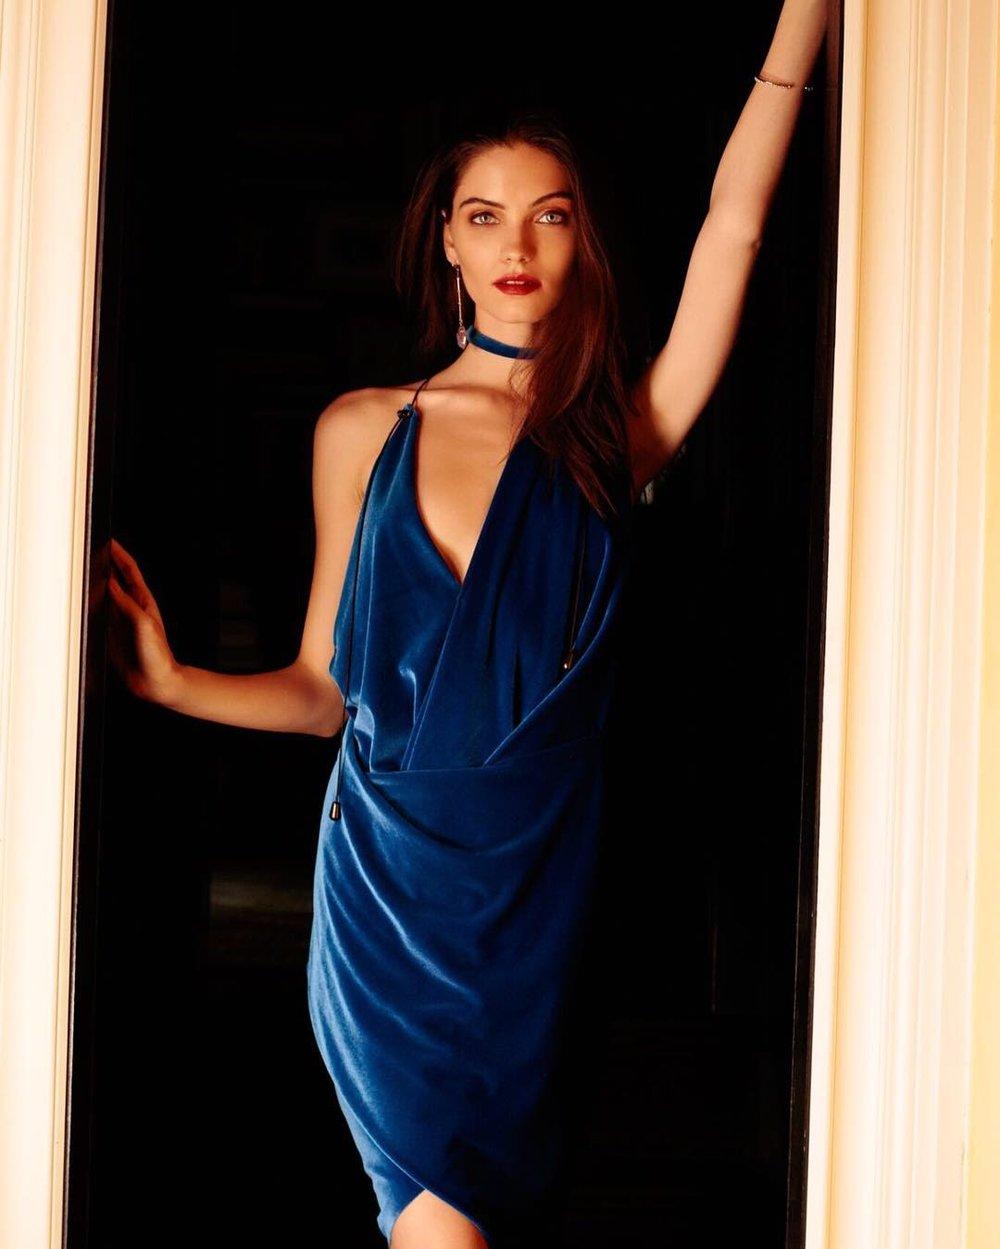 Photographer   Nick D'Orazio   Model   Stass Dabizha   Stylist   Greta Carmella